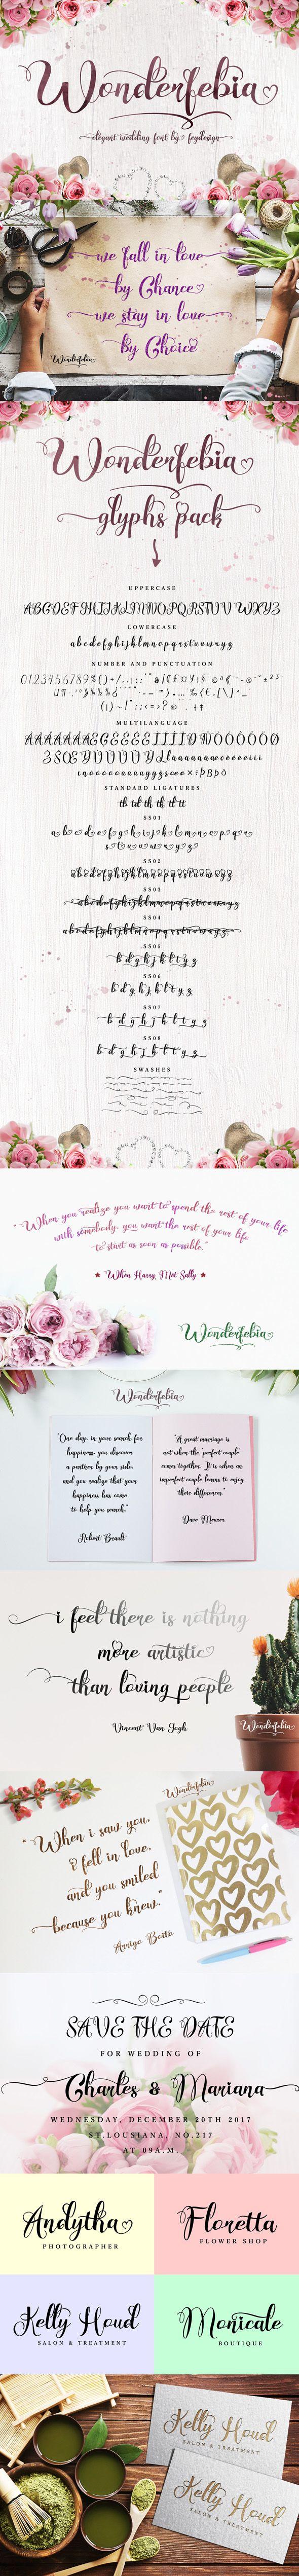 cursive fonts for wedding cards%0A Wonderfebia  Script Wedding Font